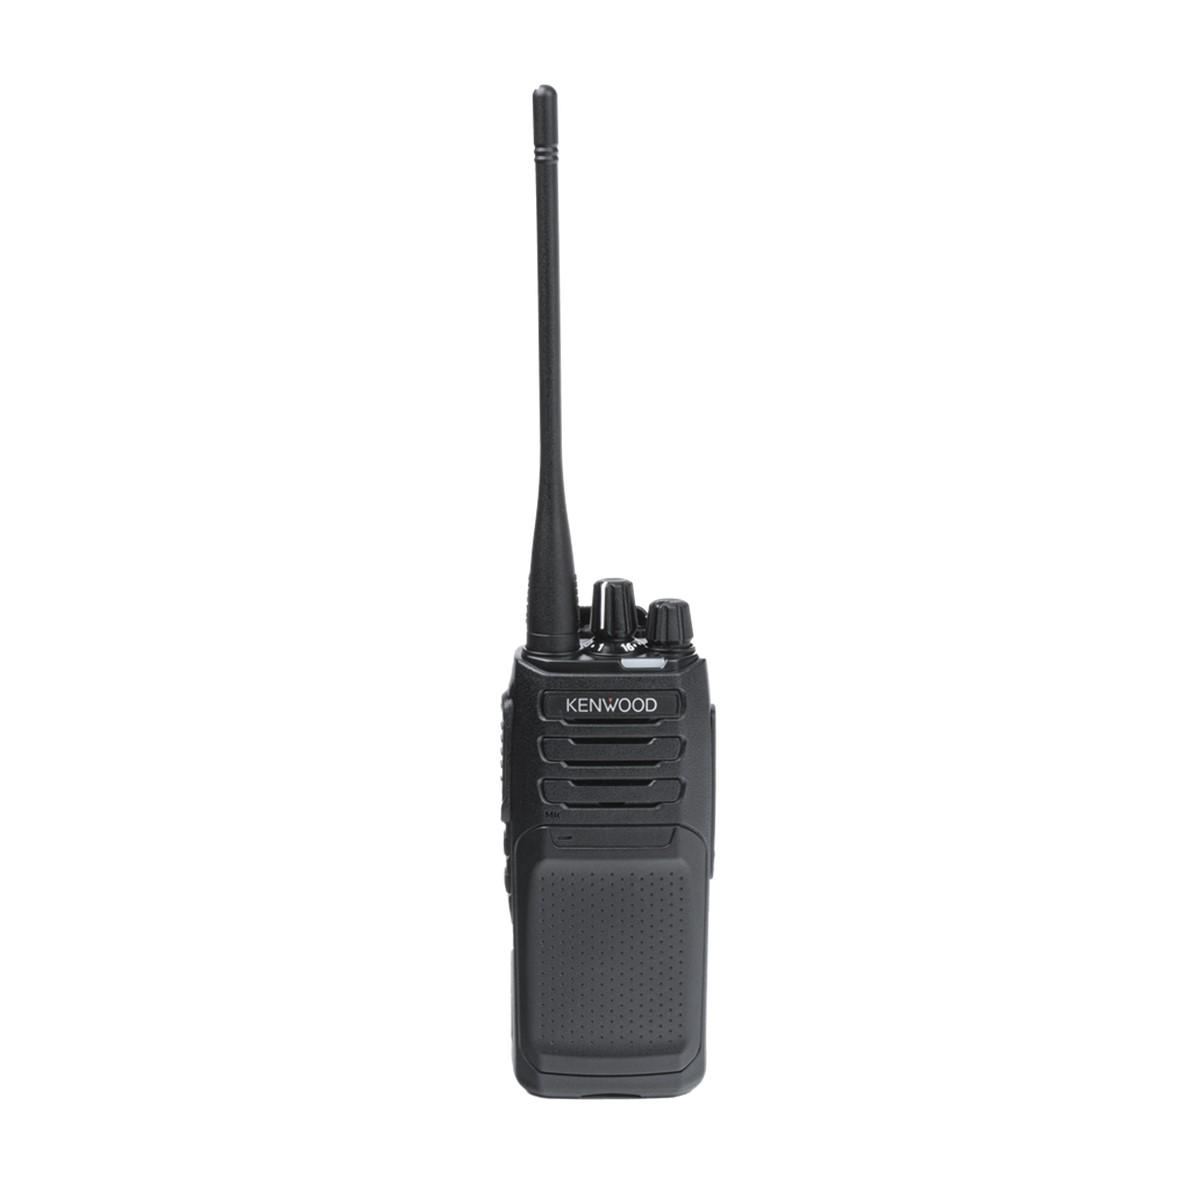 Radio KENWOOD NX-1300 Digital UHF 450-520 MHz sin pantalla y sin teclado